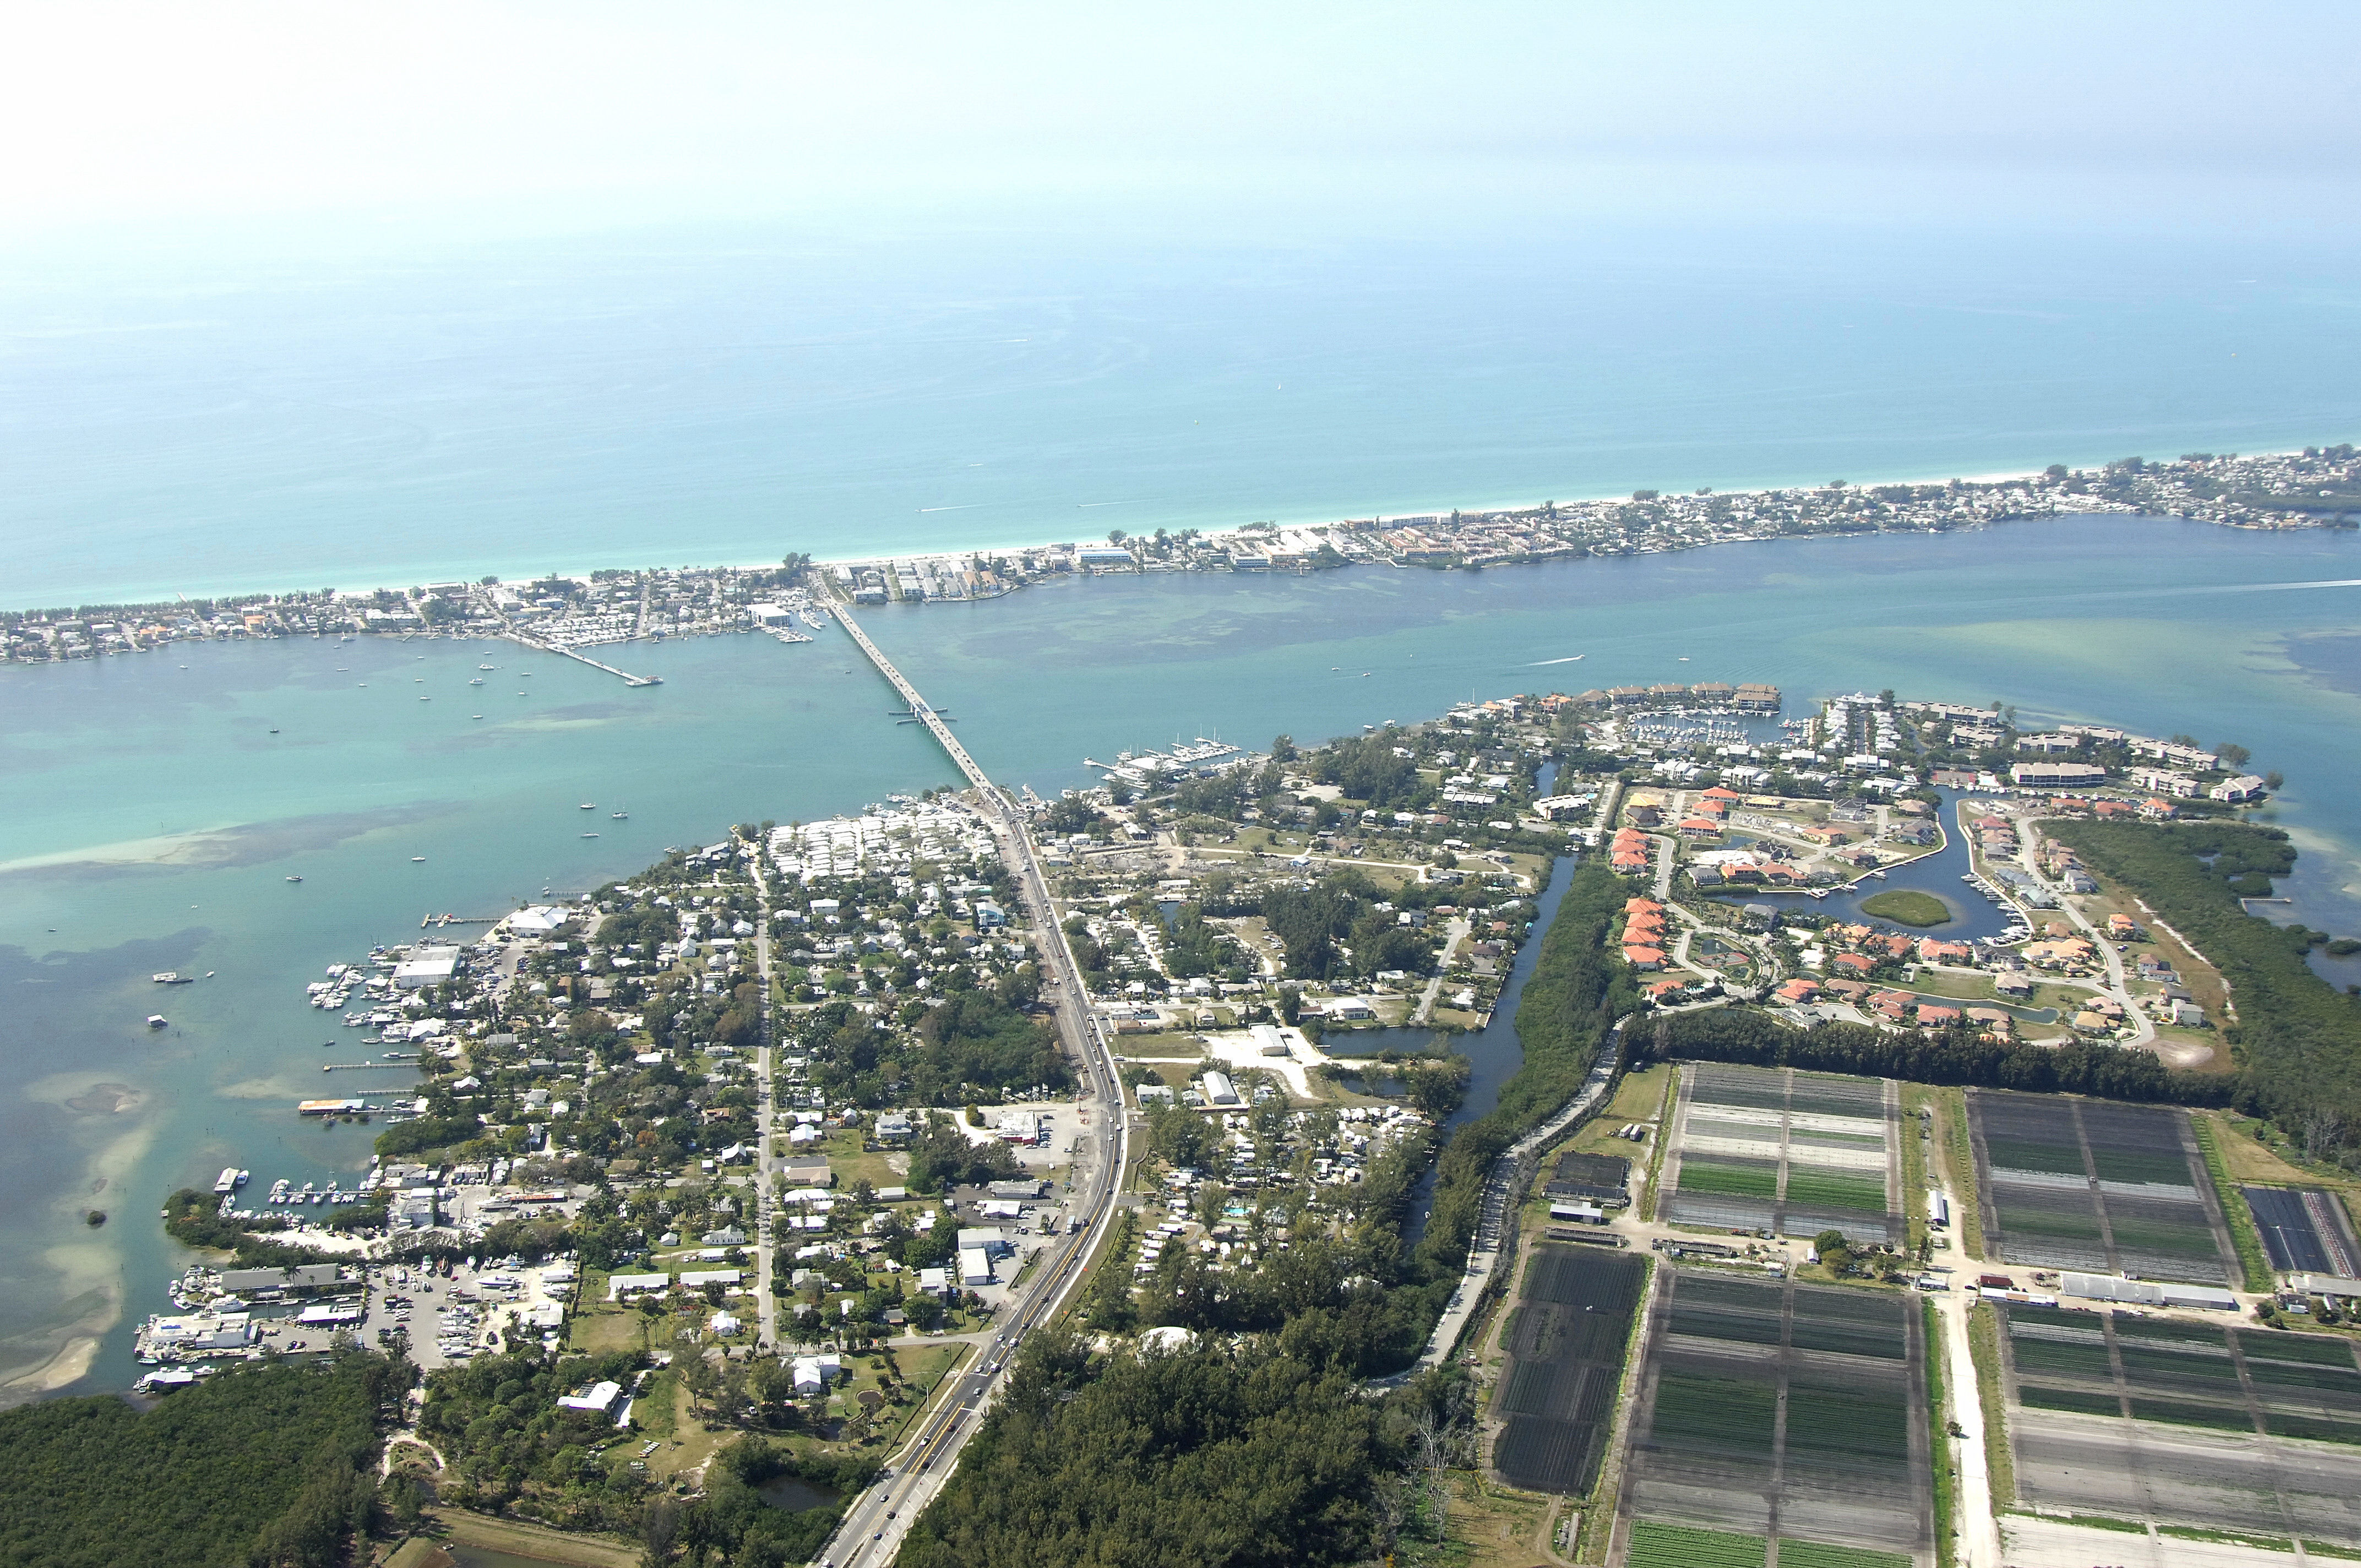 Bradenton Beach Harbor in Bradenton Beach, FL, United States